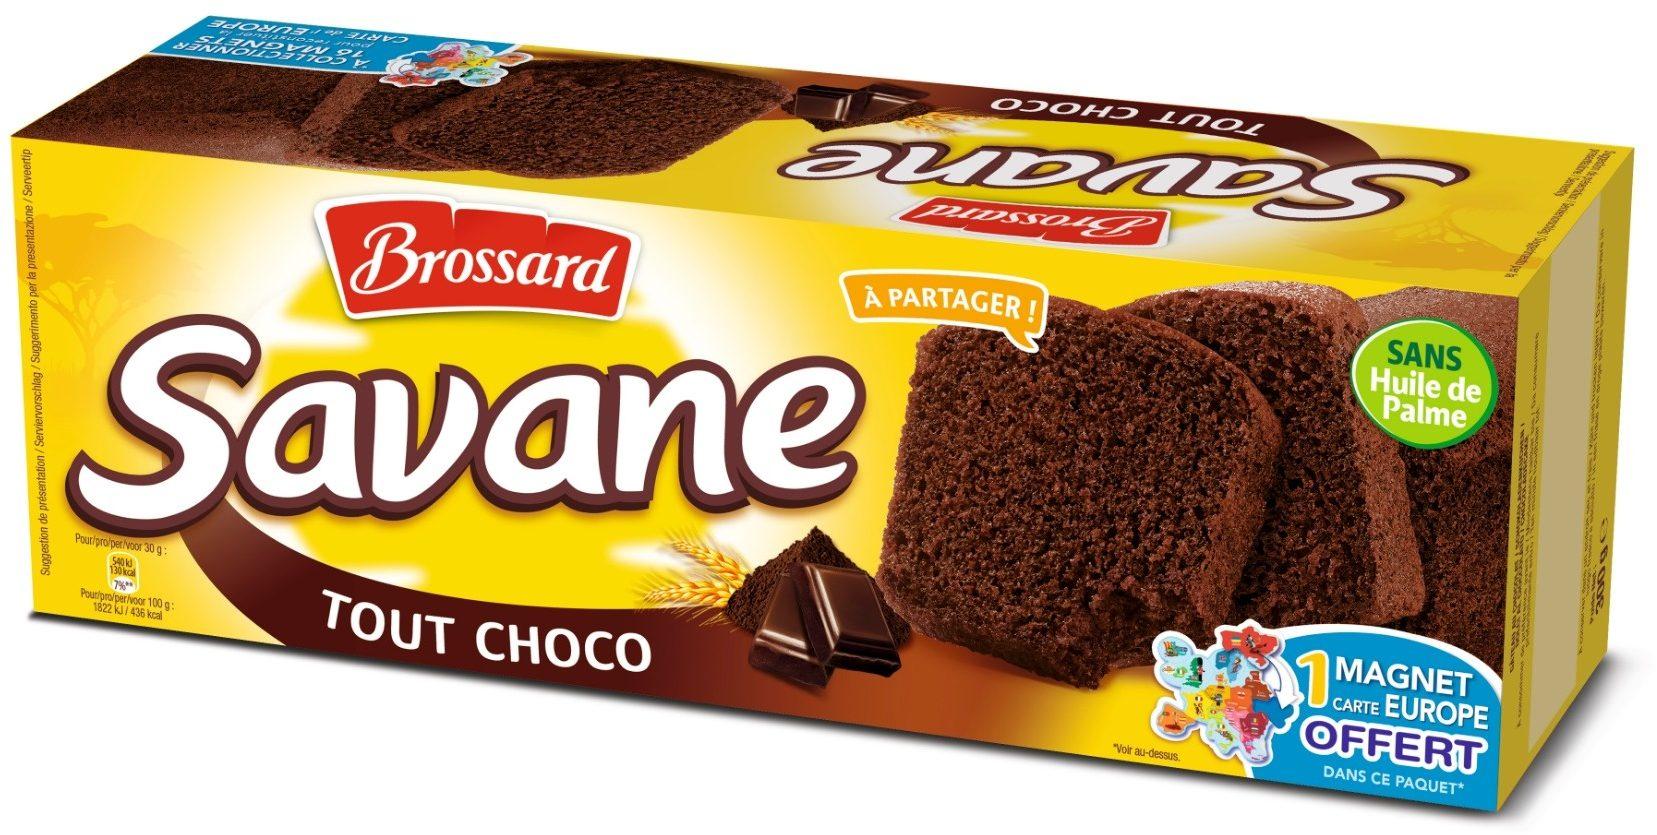 Savane Tout Choco - Product